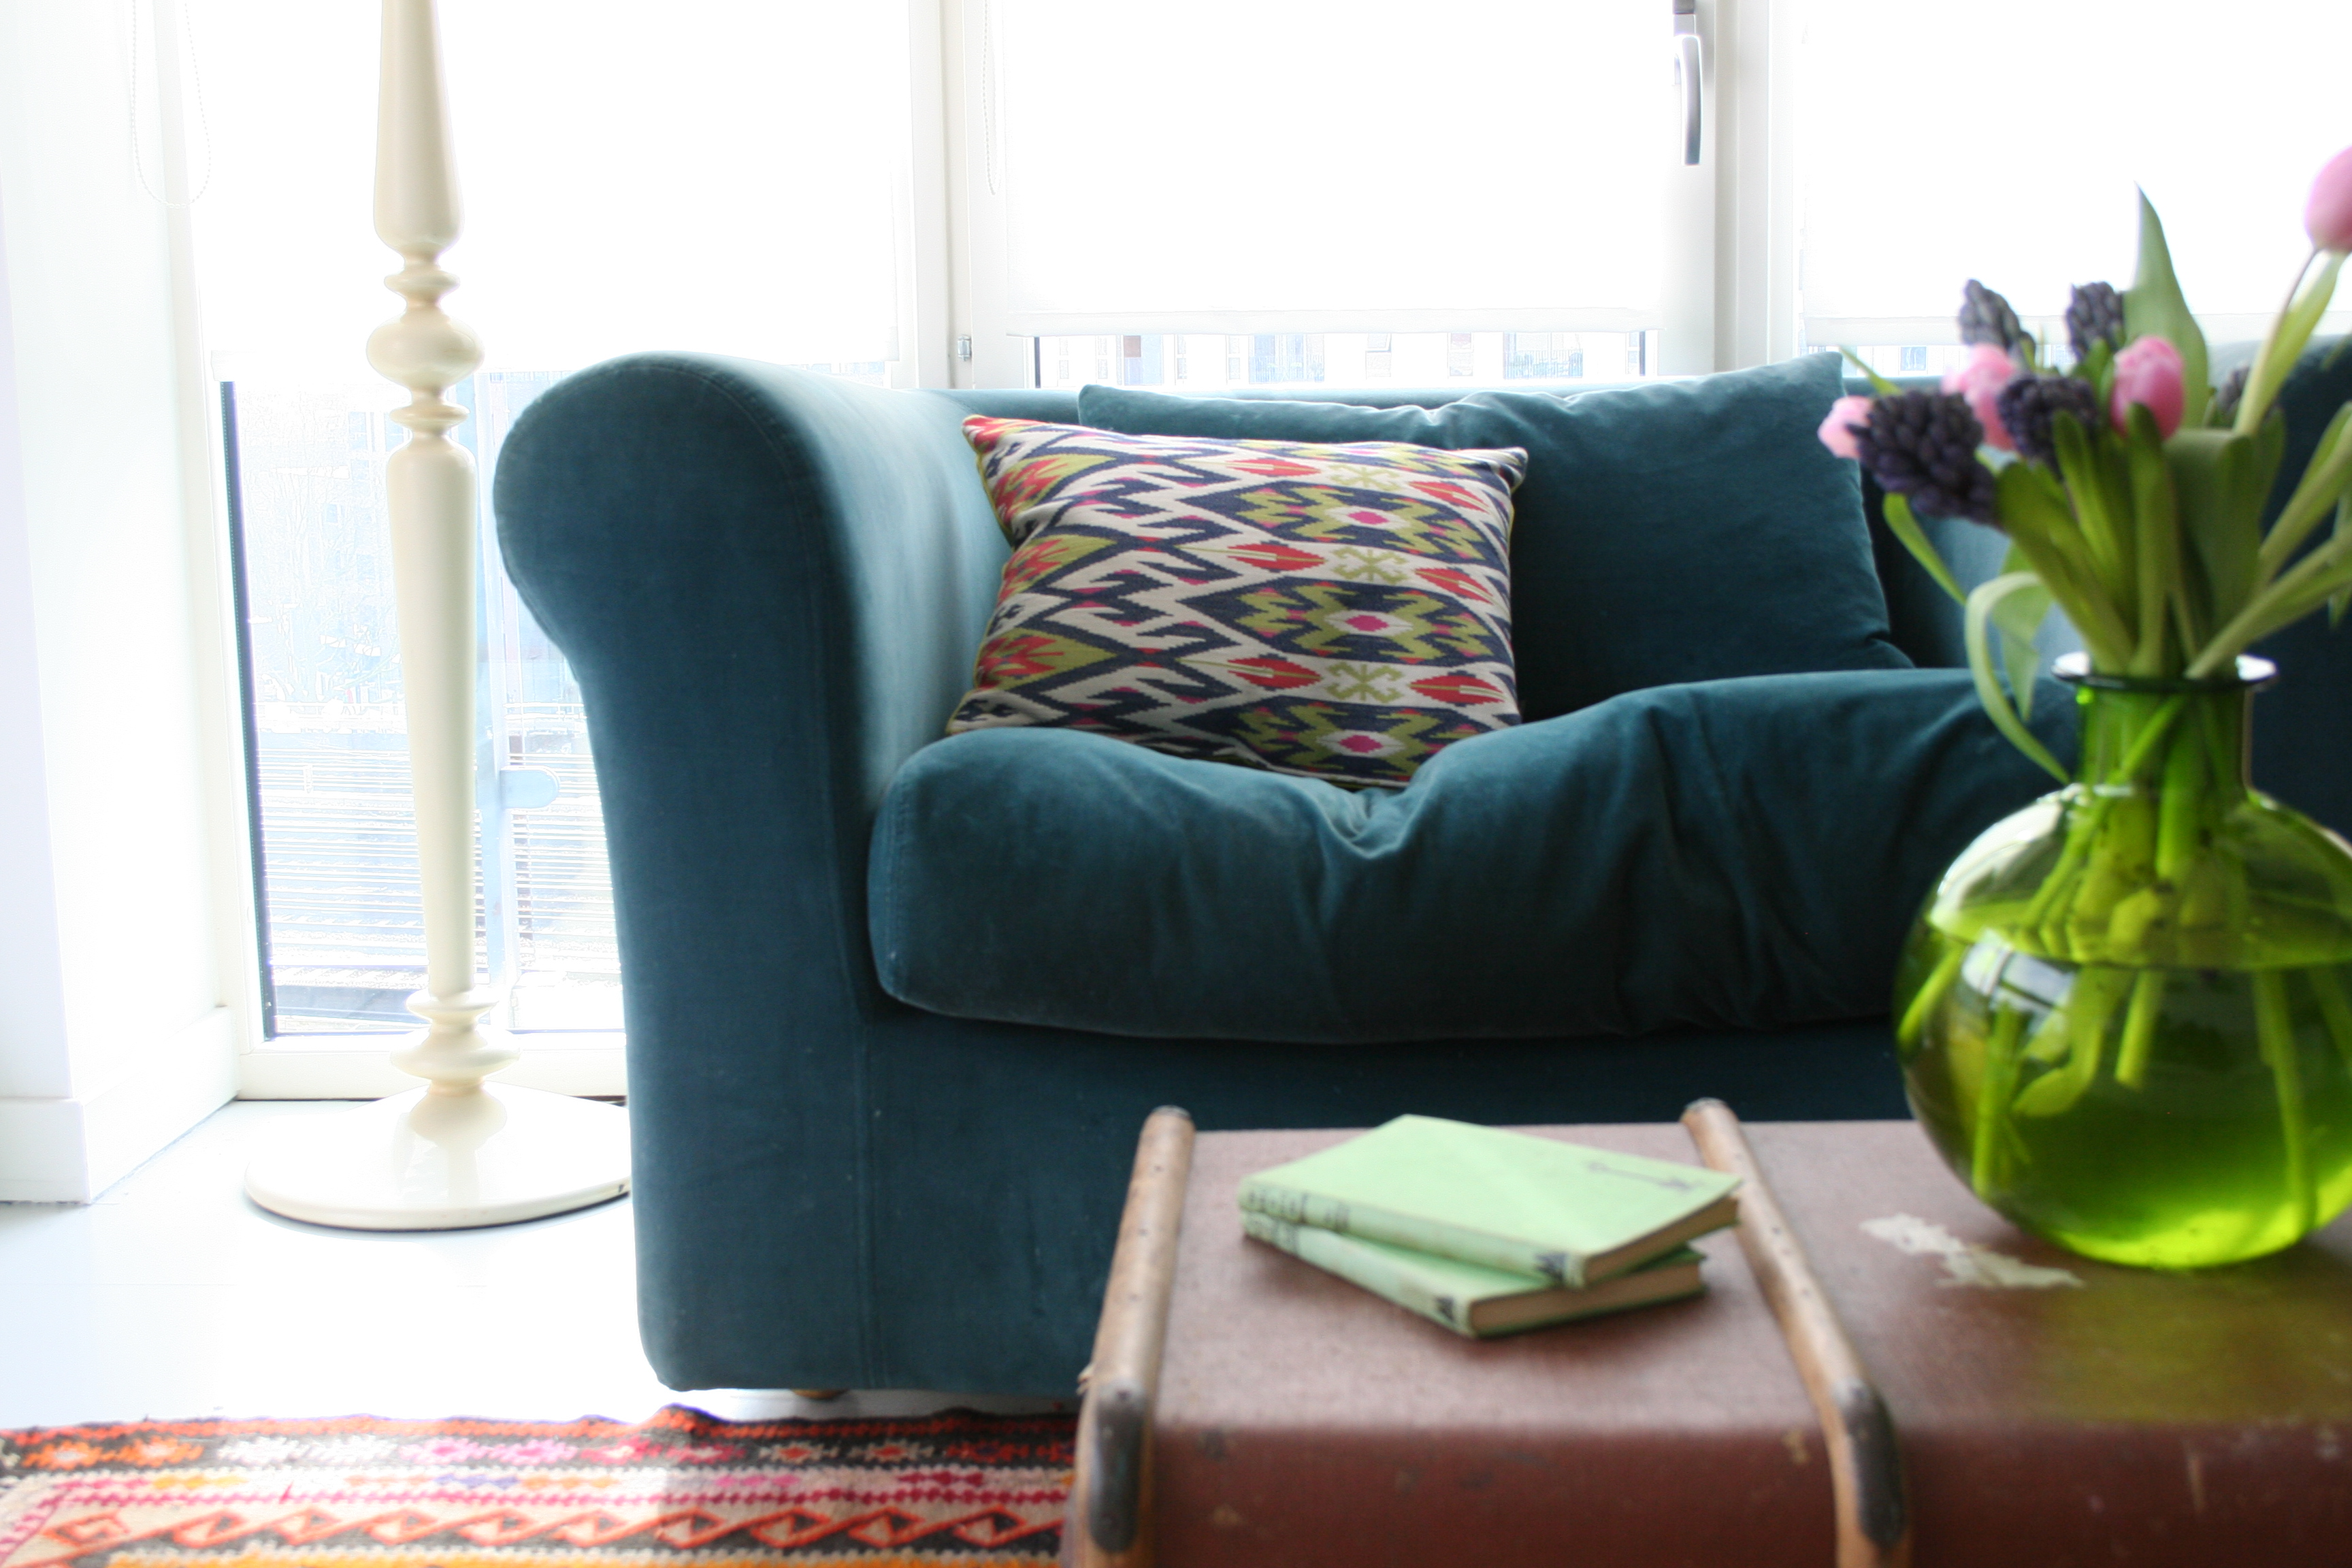 Selling homewares on eBay tips | Teal velvet loveseat| Apartment Apothecary